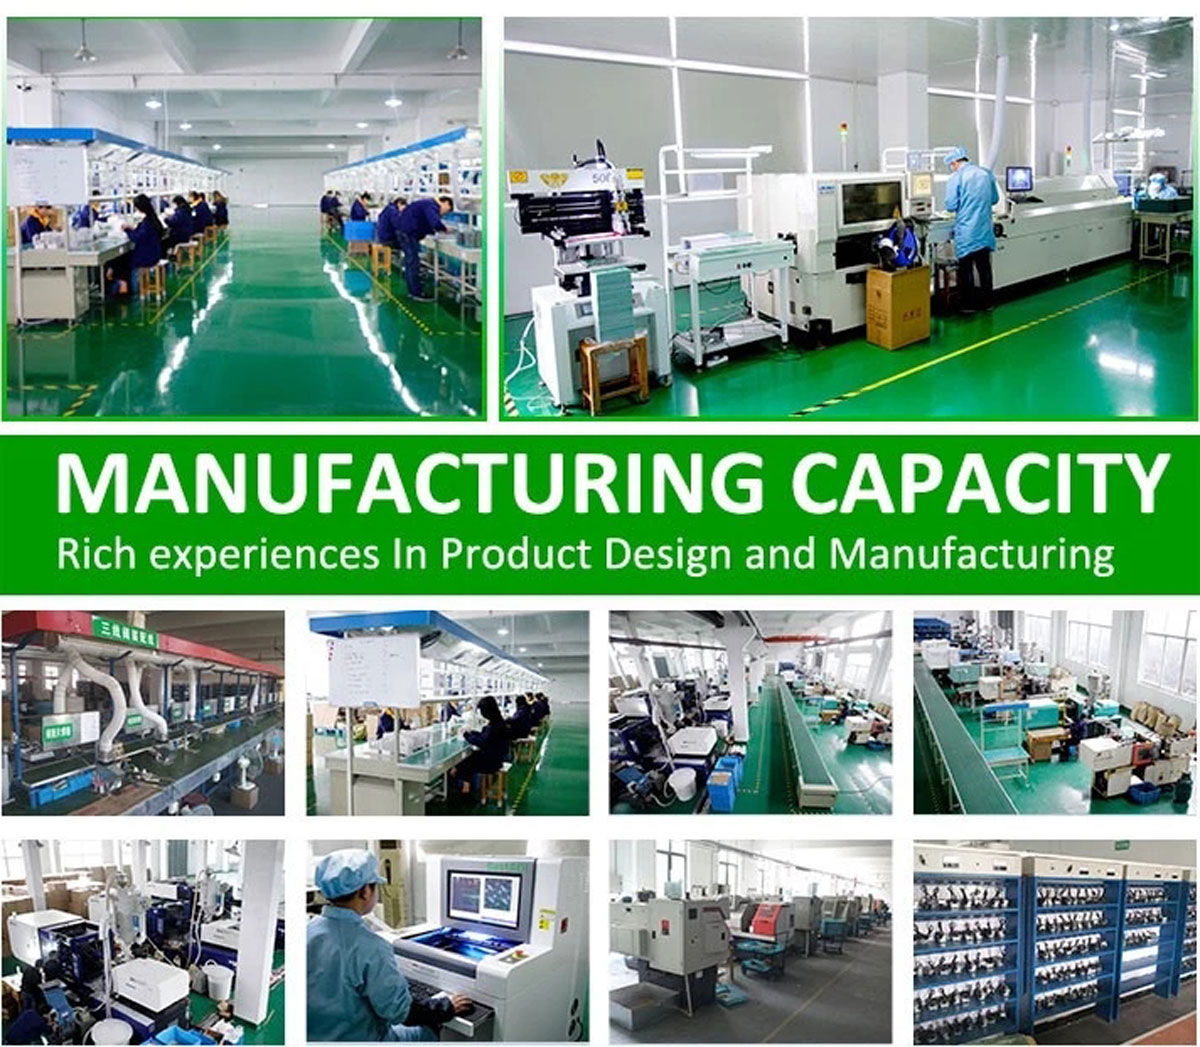 Hotowell manufacturing capacity.jpg